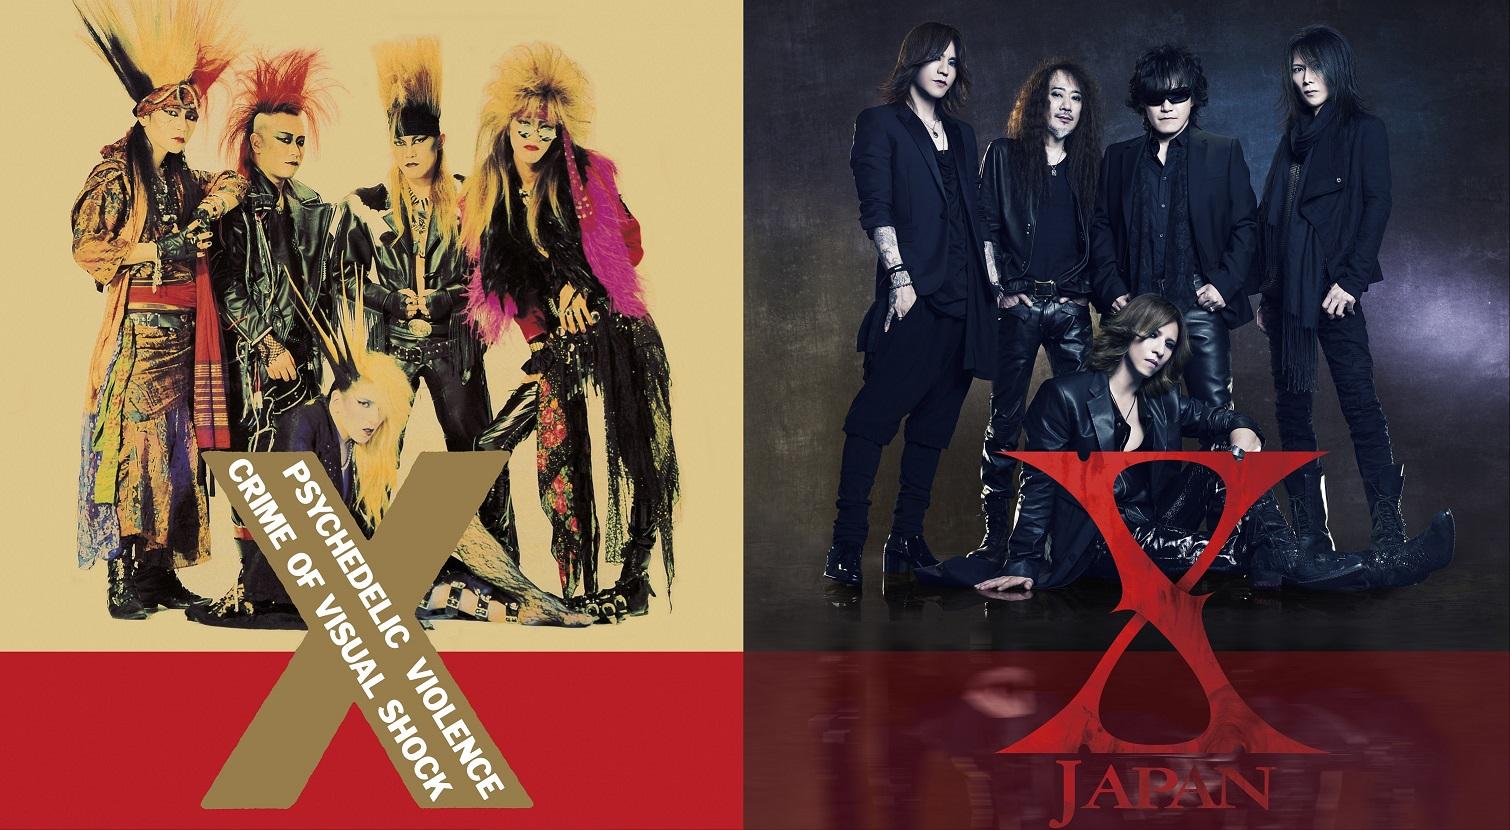 X Japan 世界各国の映画館で生中継!!自身初、ファン待望のmadison Square Garden公演を